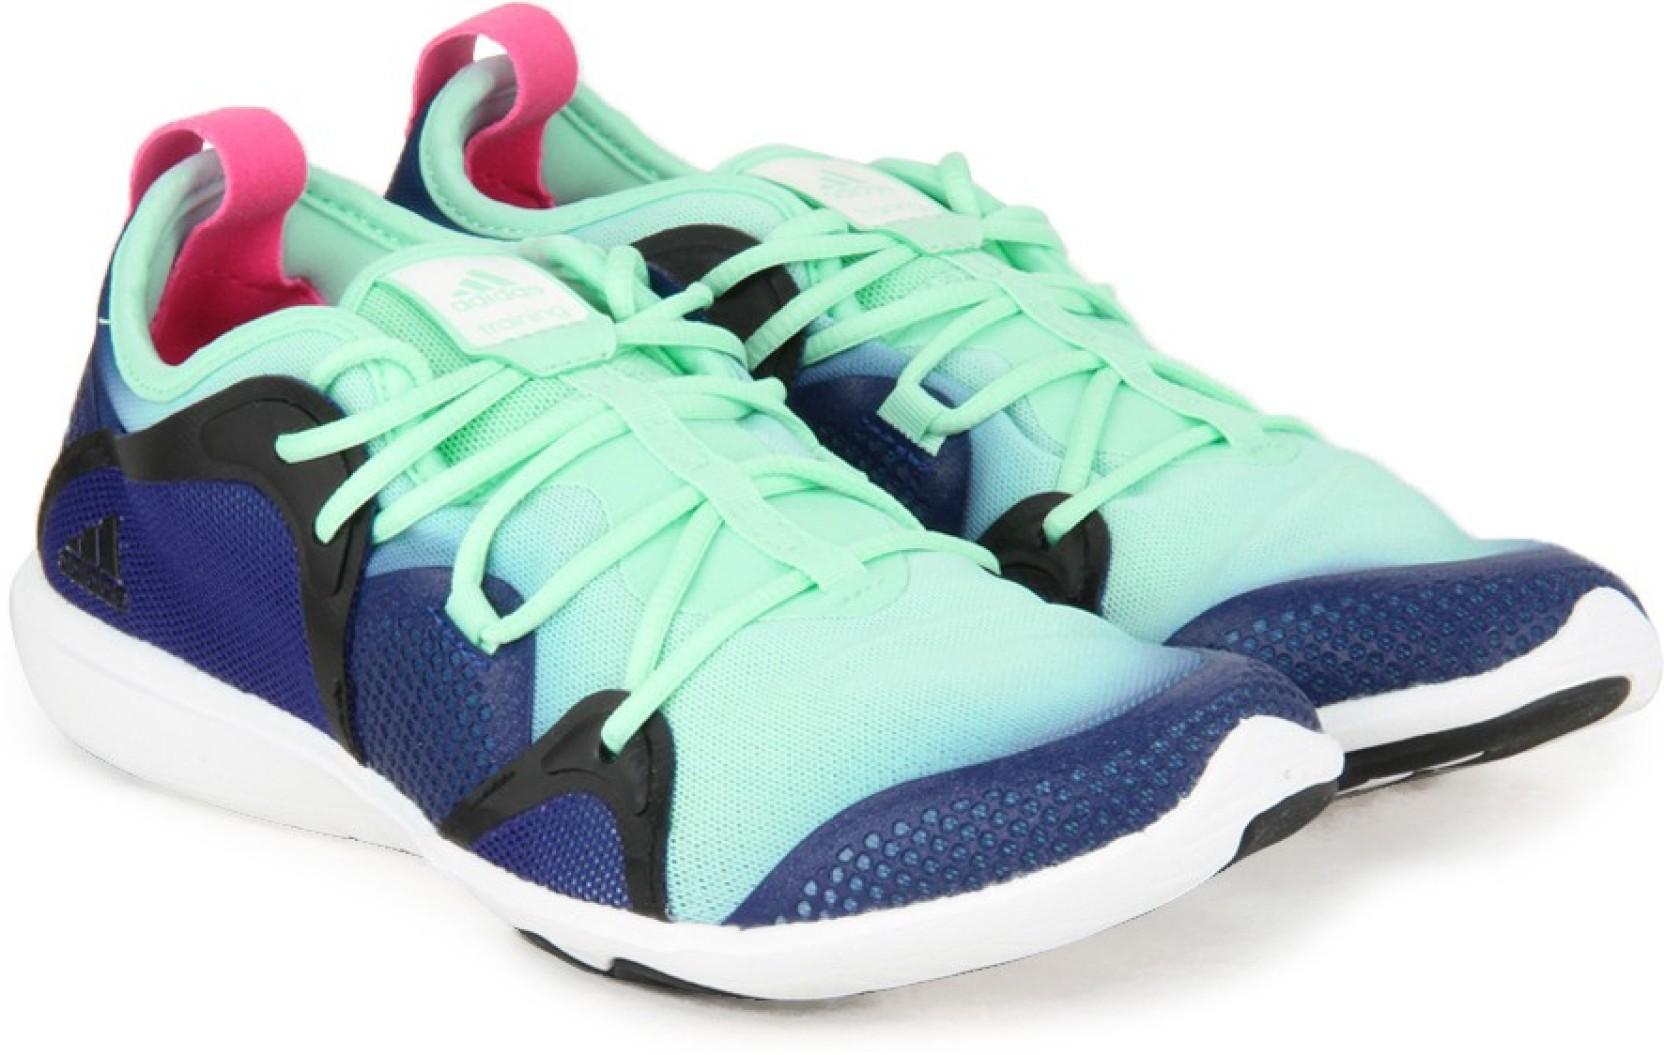 ADIDAS ADIPURE 360.4 W Training Shoes For Women - Buy UNIINK NGTMET ... ec8cb544bf